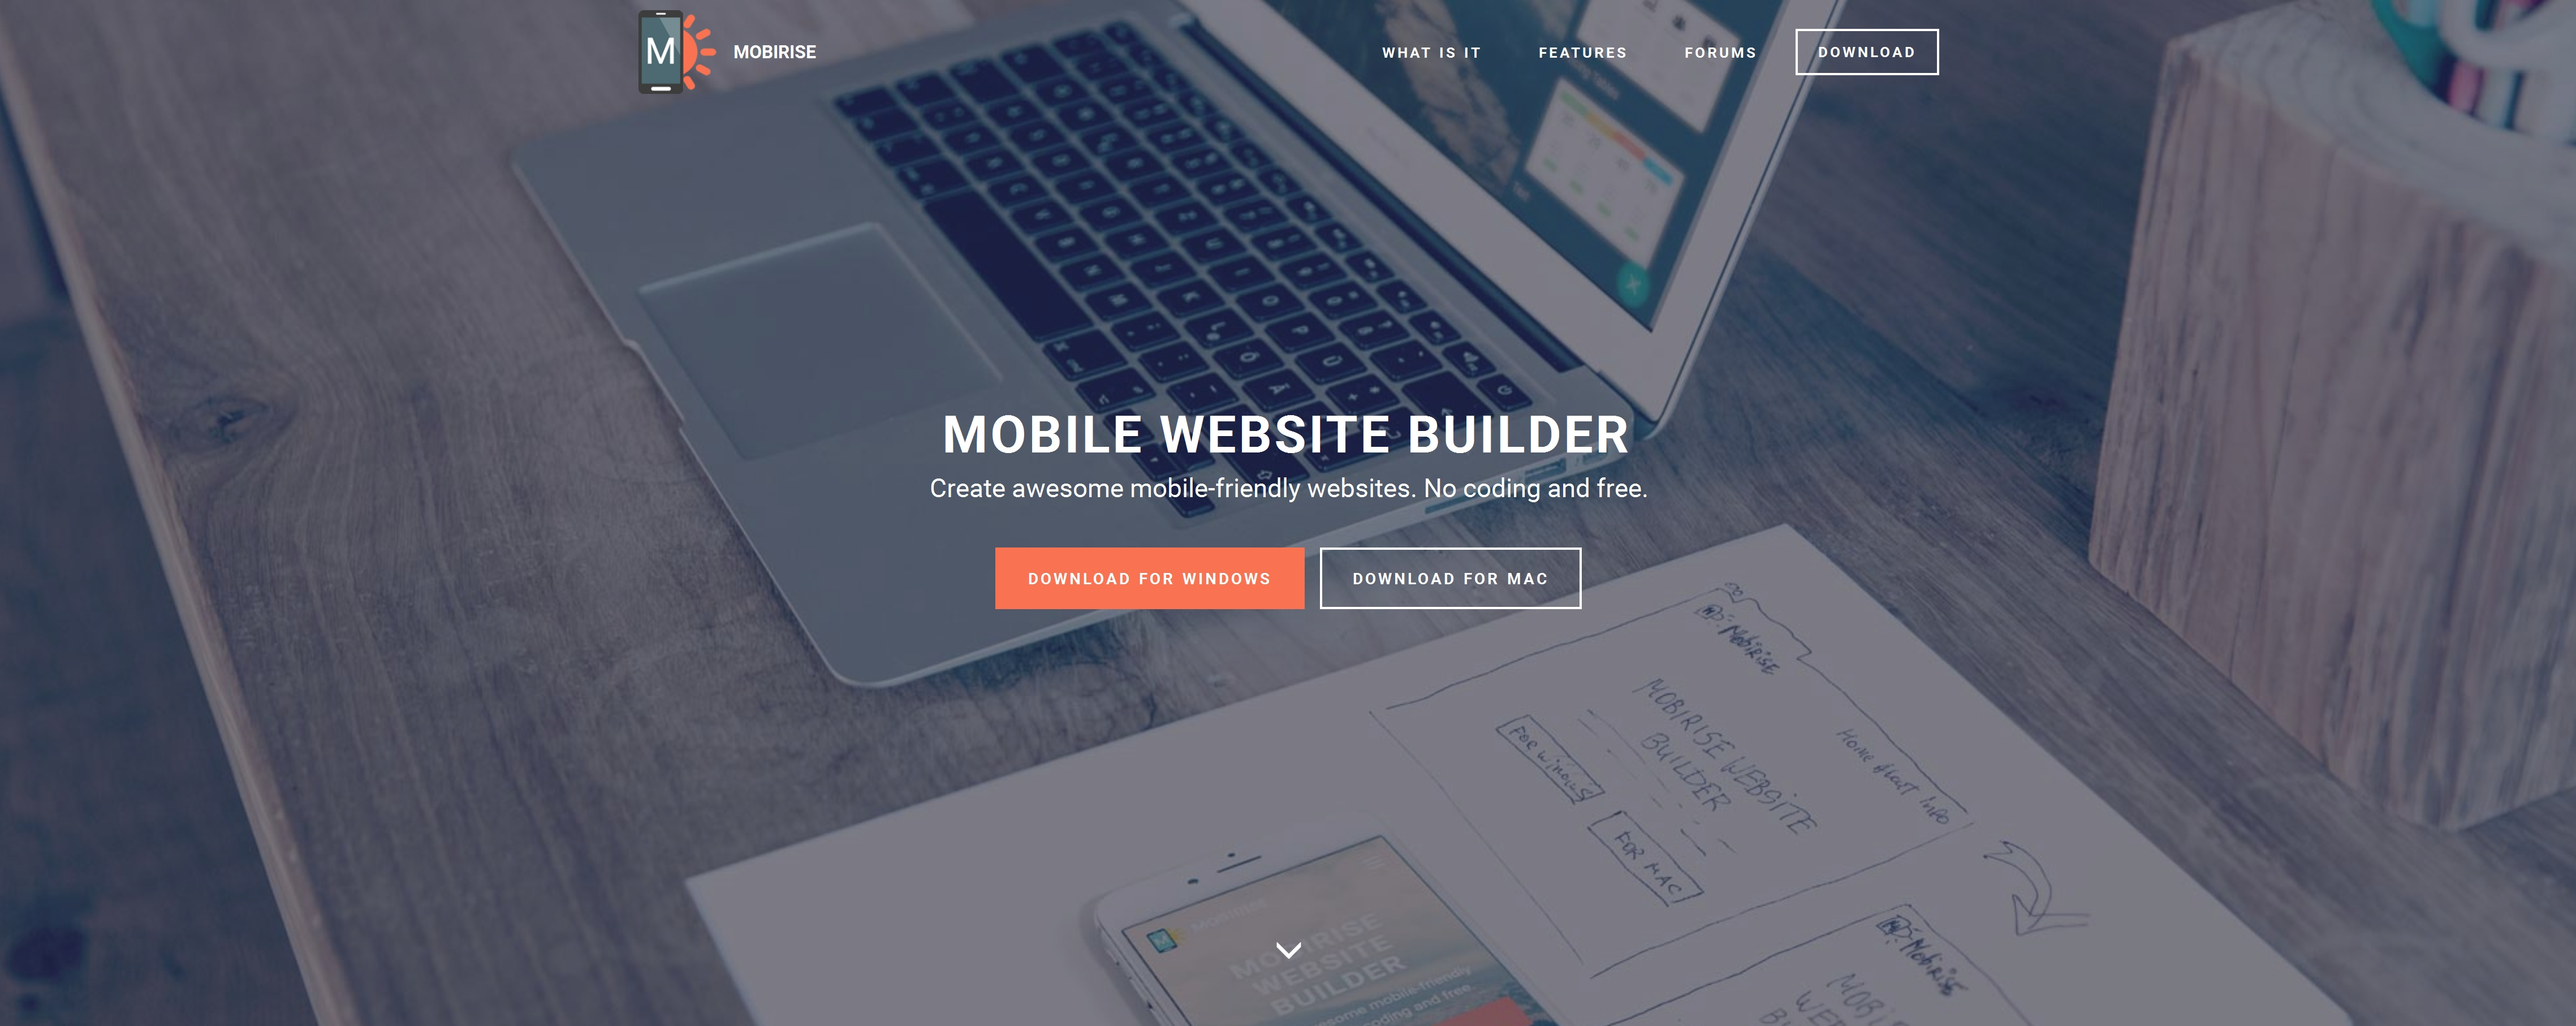 WYSIWYG Mobile Website Creator Review